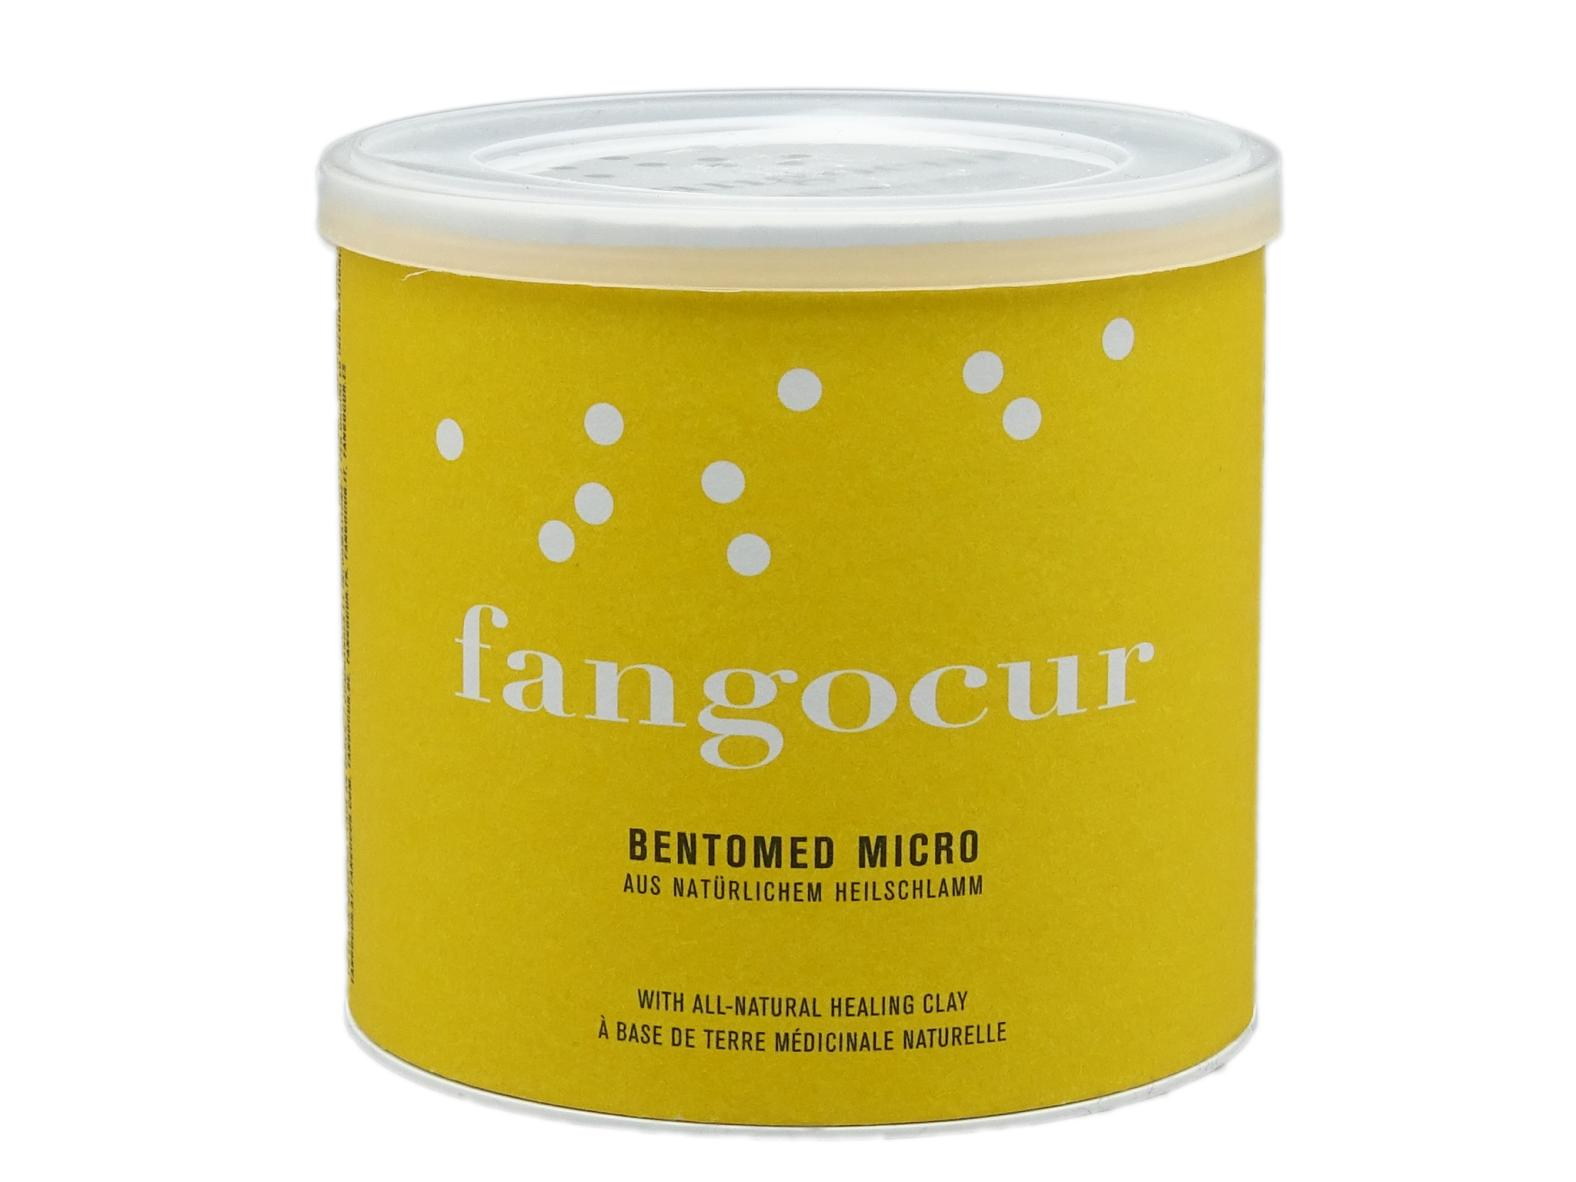 Fangocur Bentomed Micro - 200ml Dose - Gossendorfer Naturfango